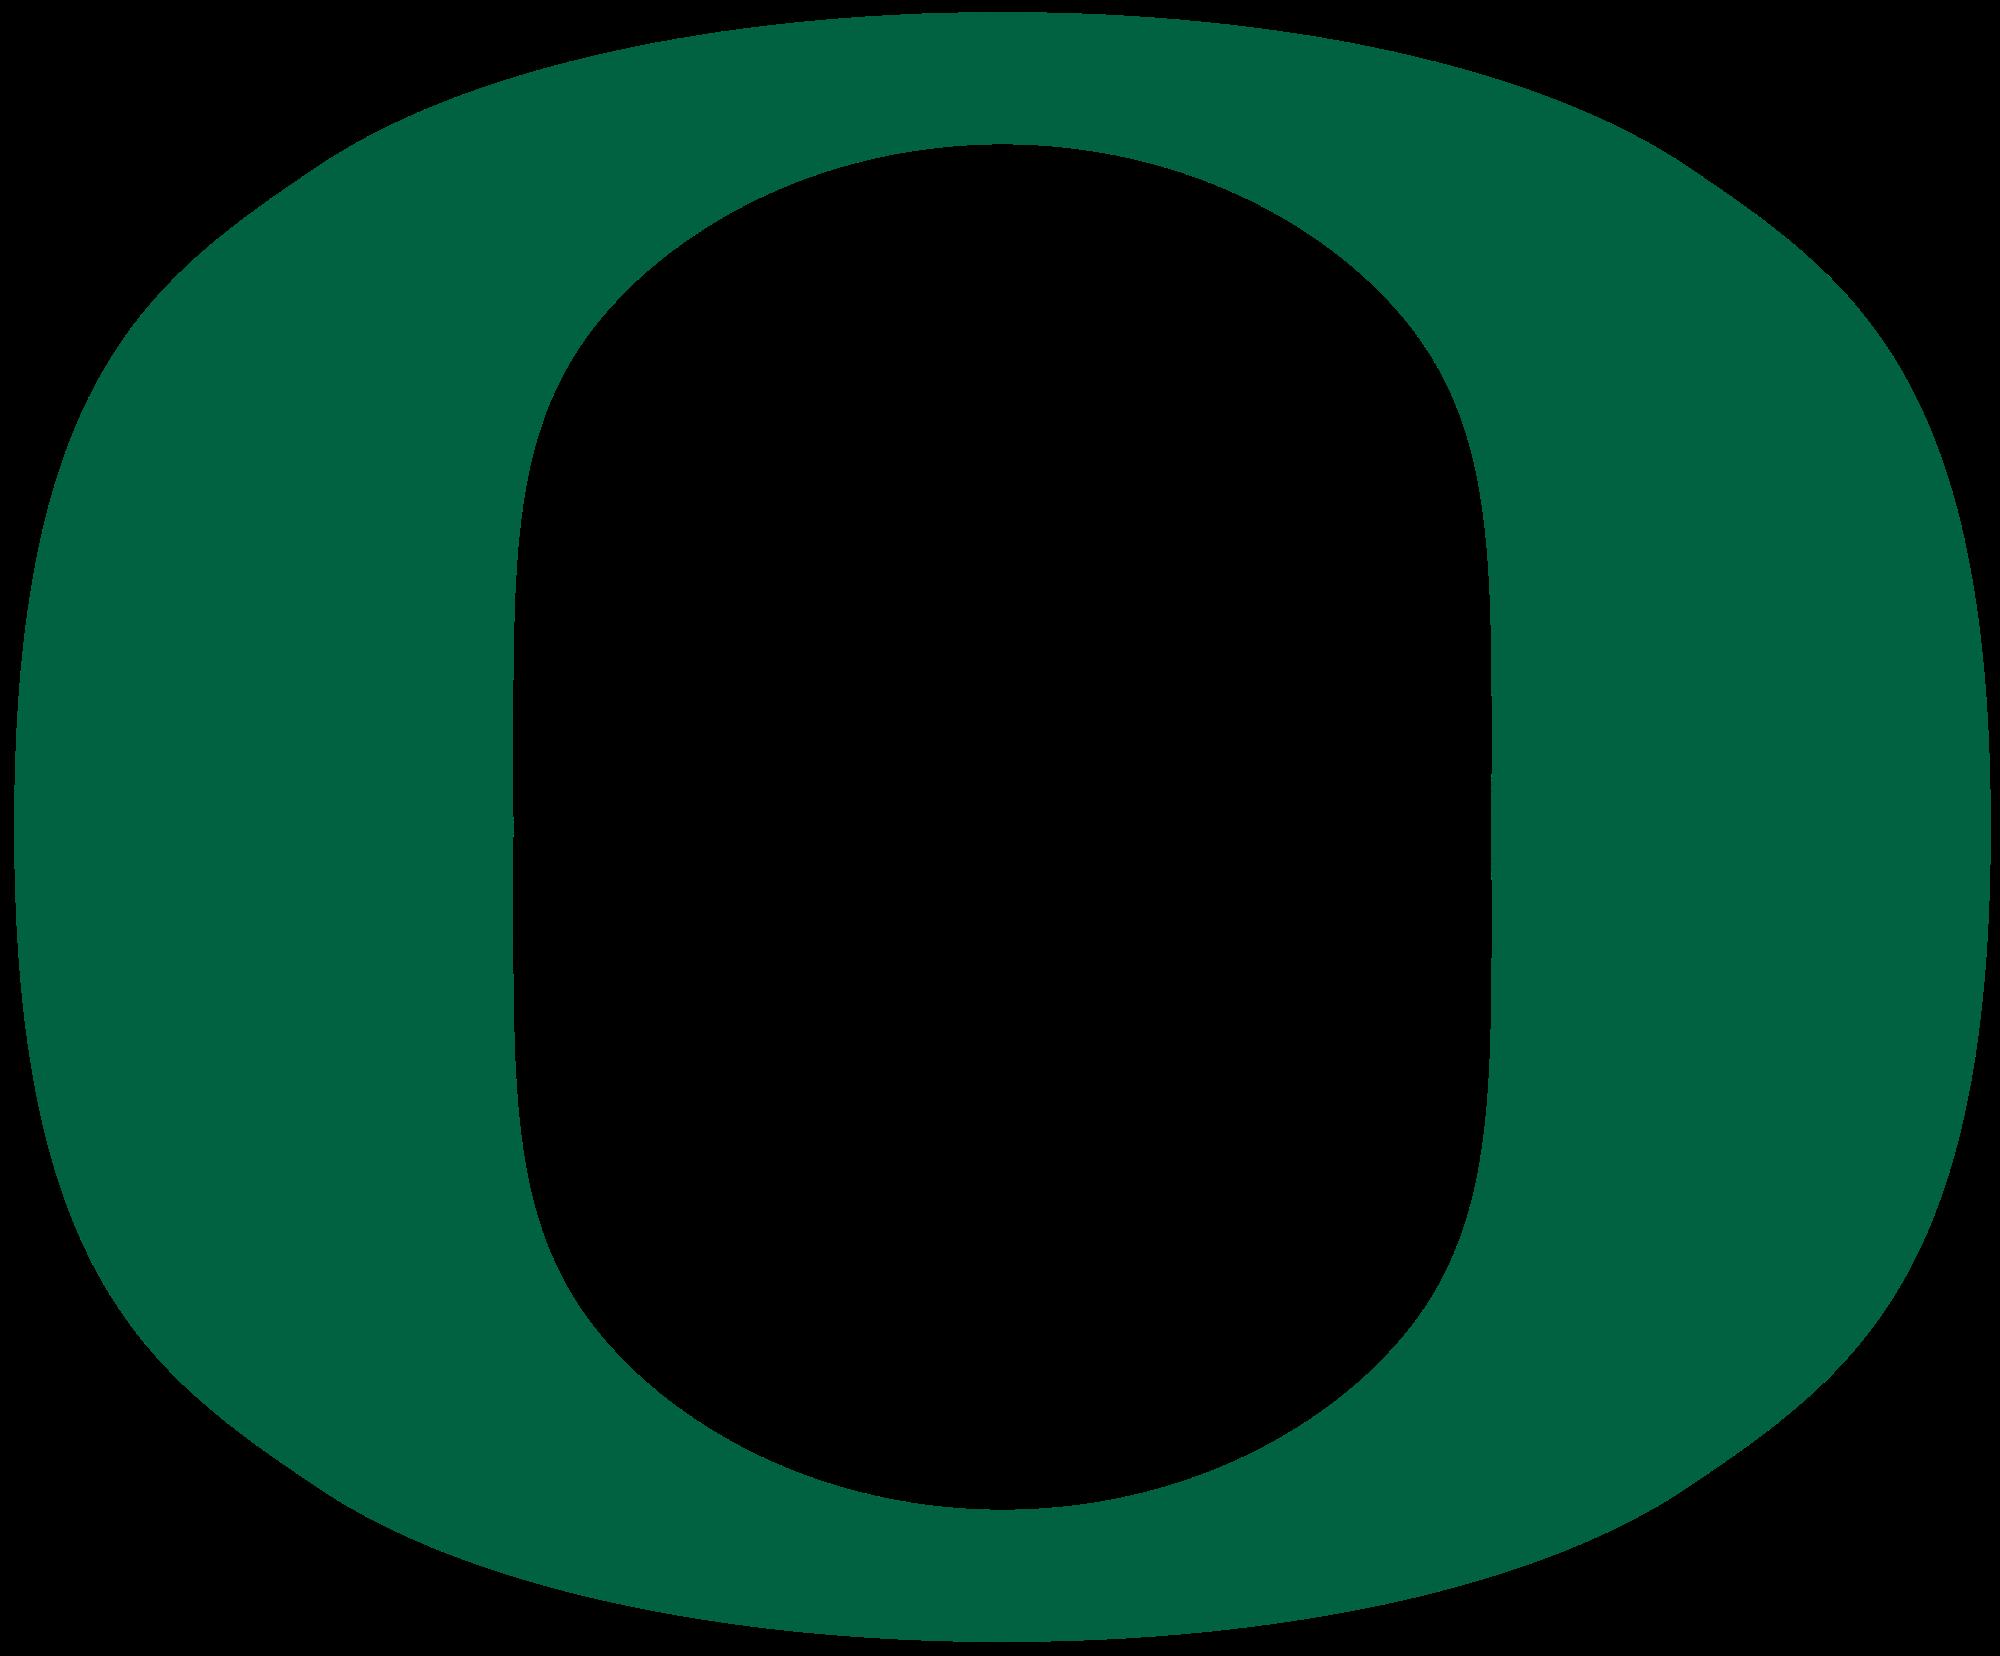 Oregon svg #9, Download drawings